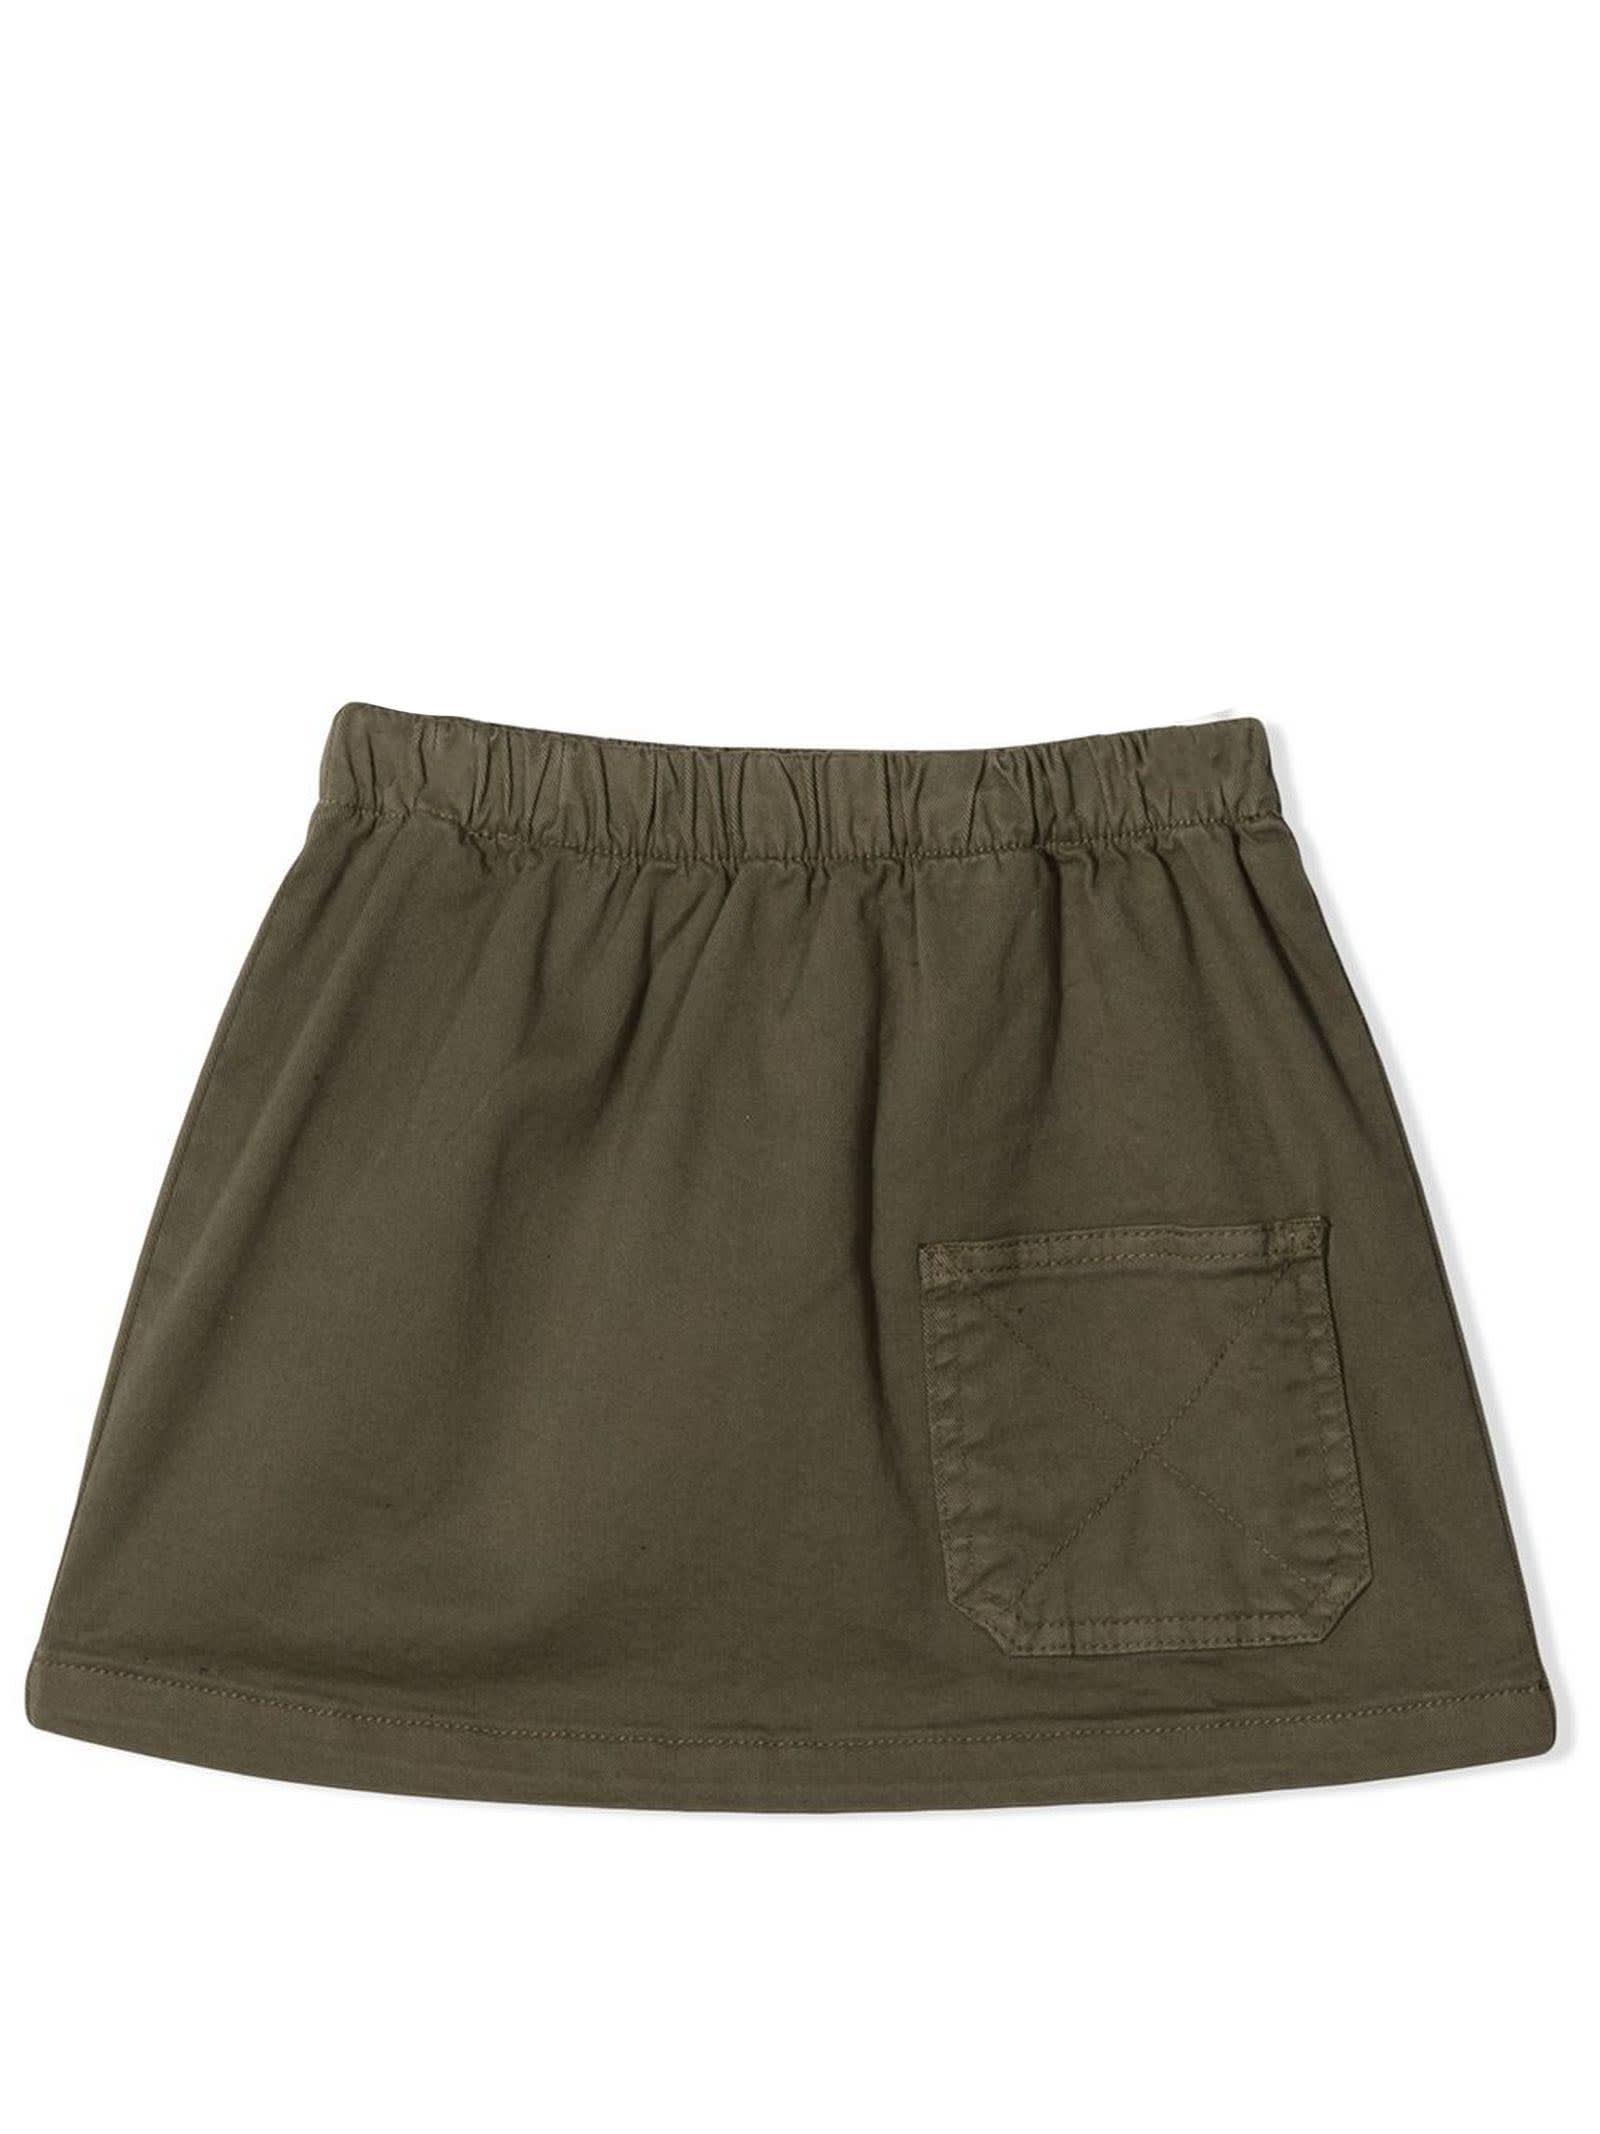 Khaki Green Cargo Mini Skirt